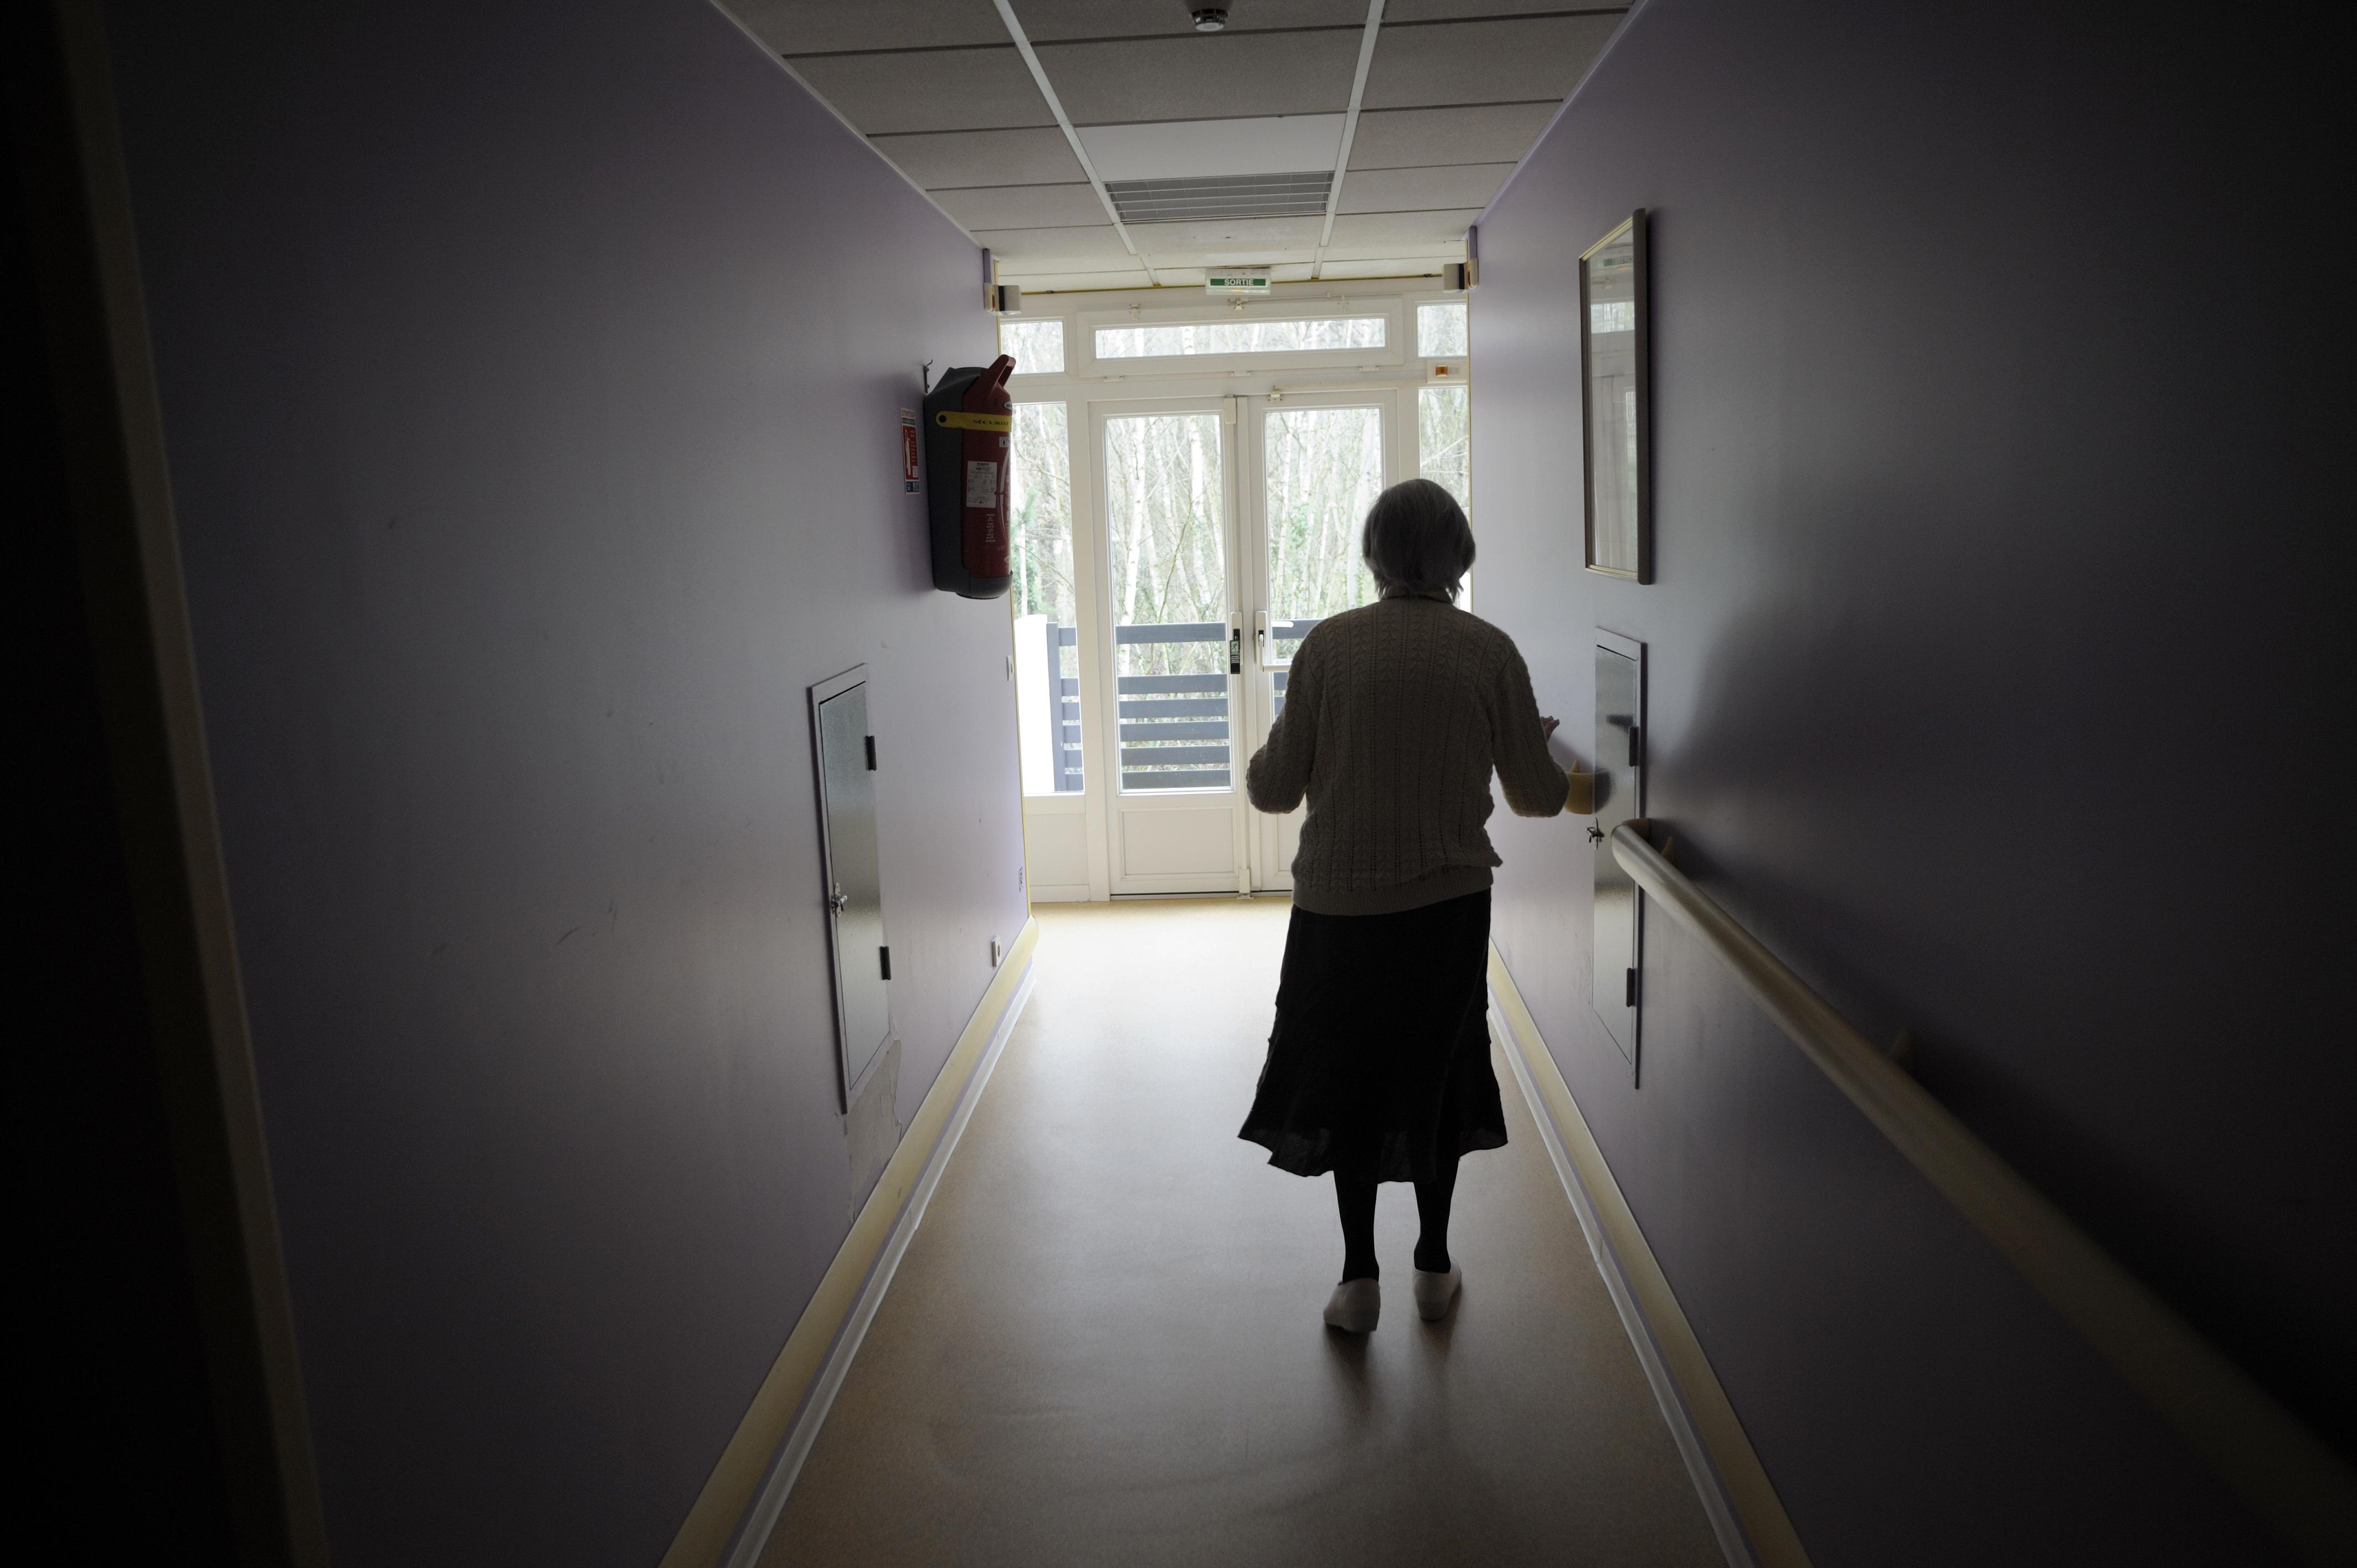 half of nursing homes scrutinized on safety still treacherous